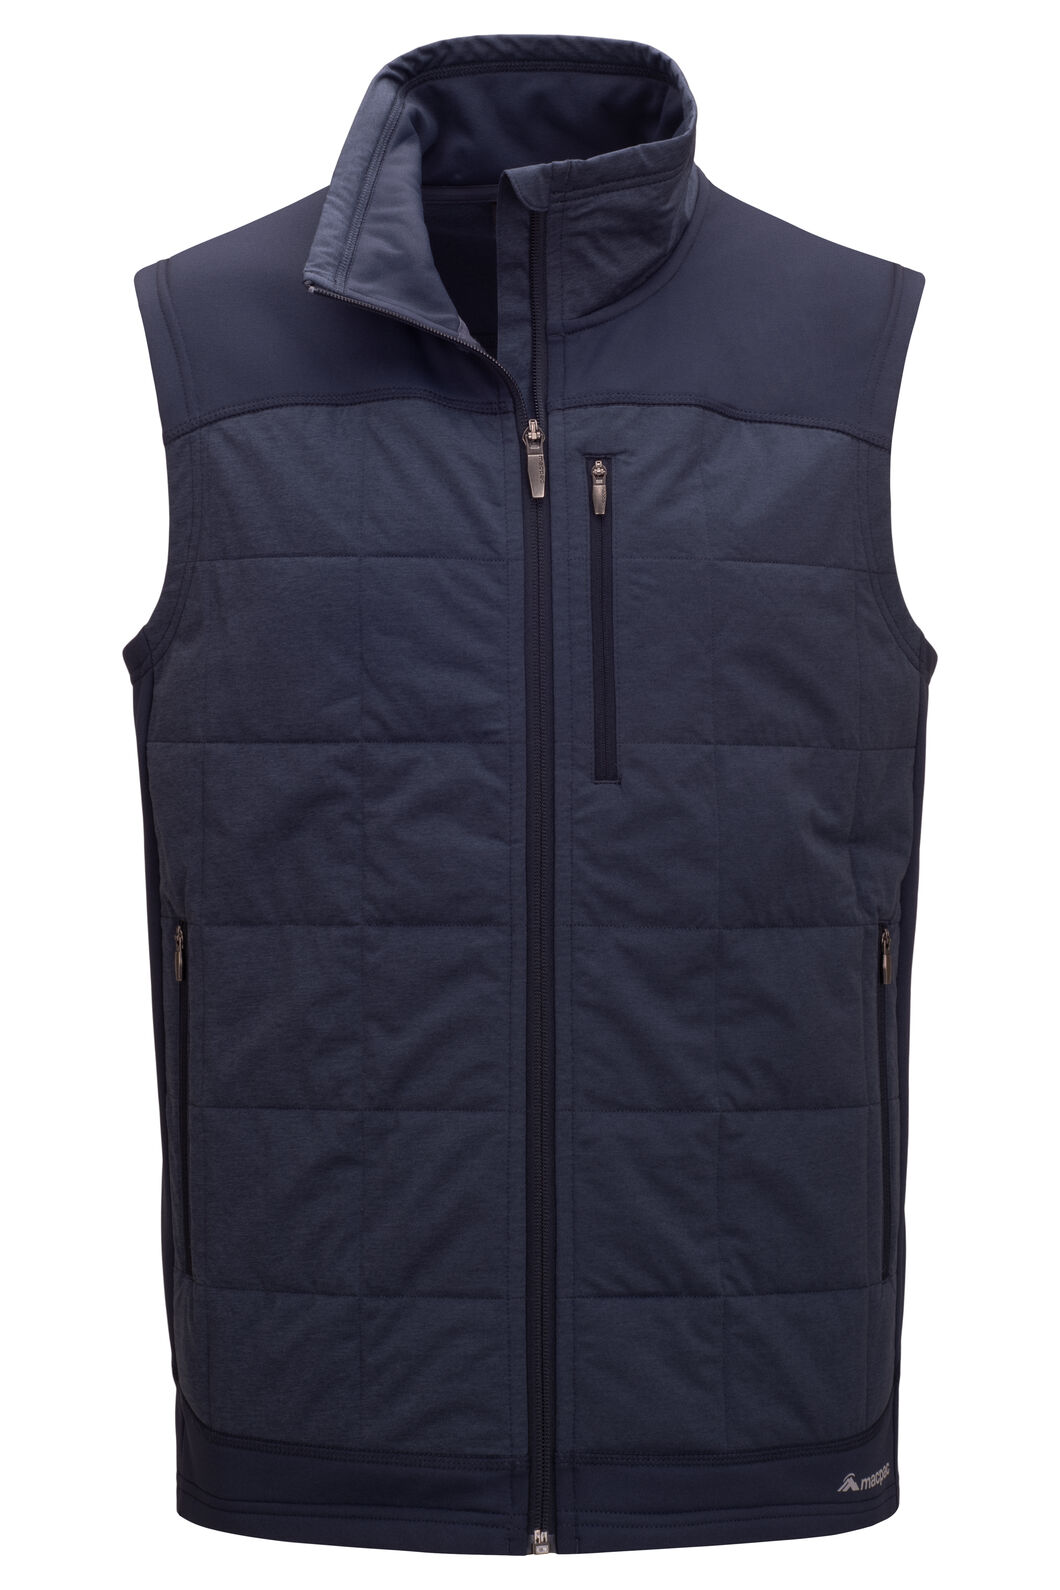 Macpac Men's Accelerate PrimaLoft® Fleece Vest, BLUE NIGHTS, hi-res